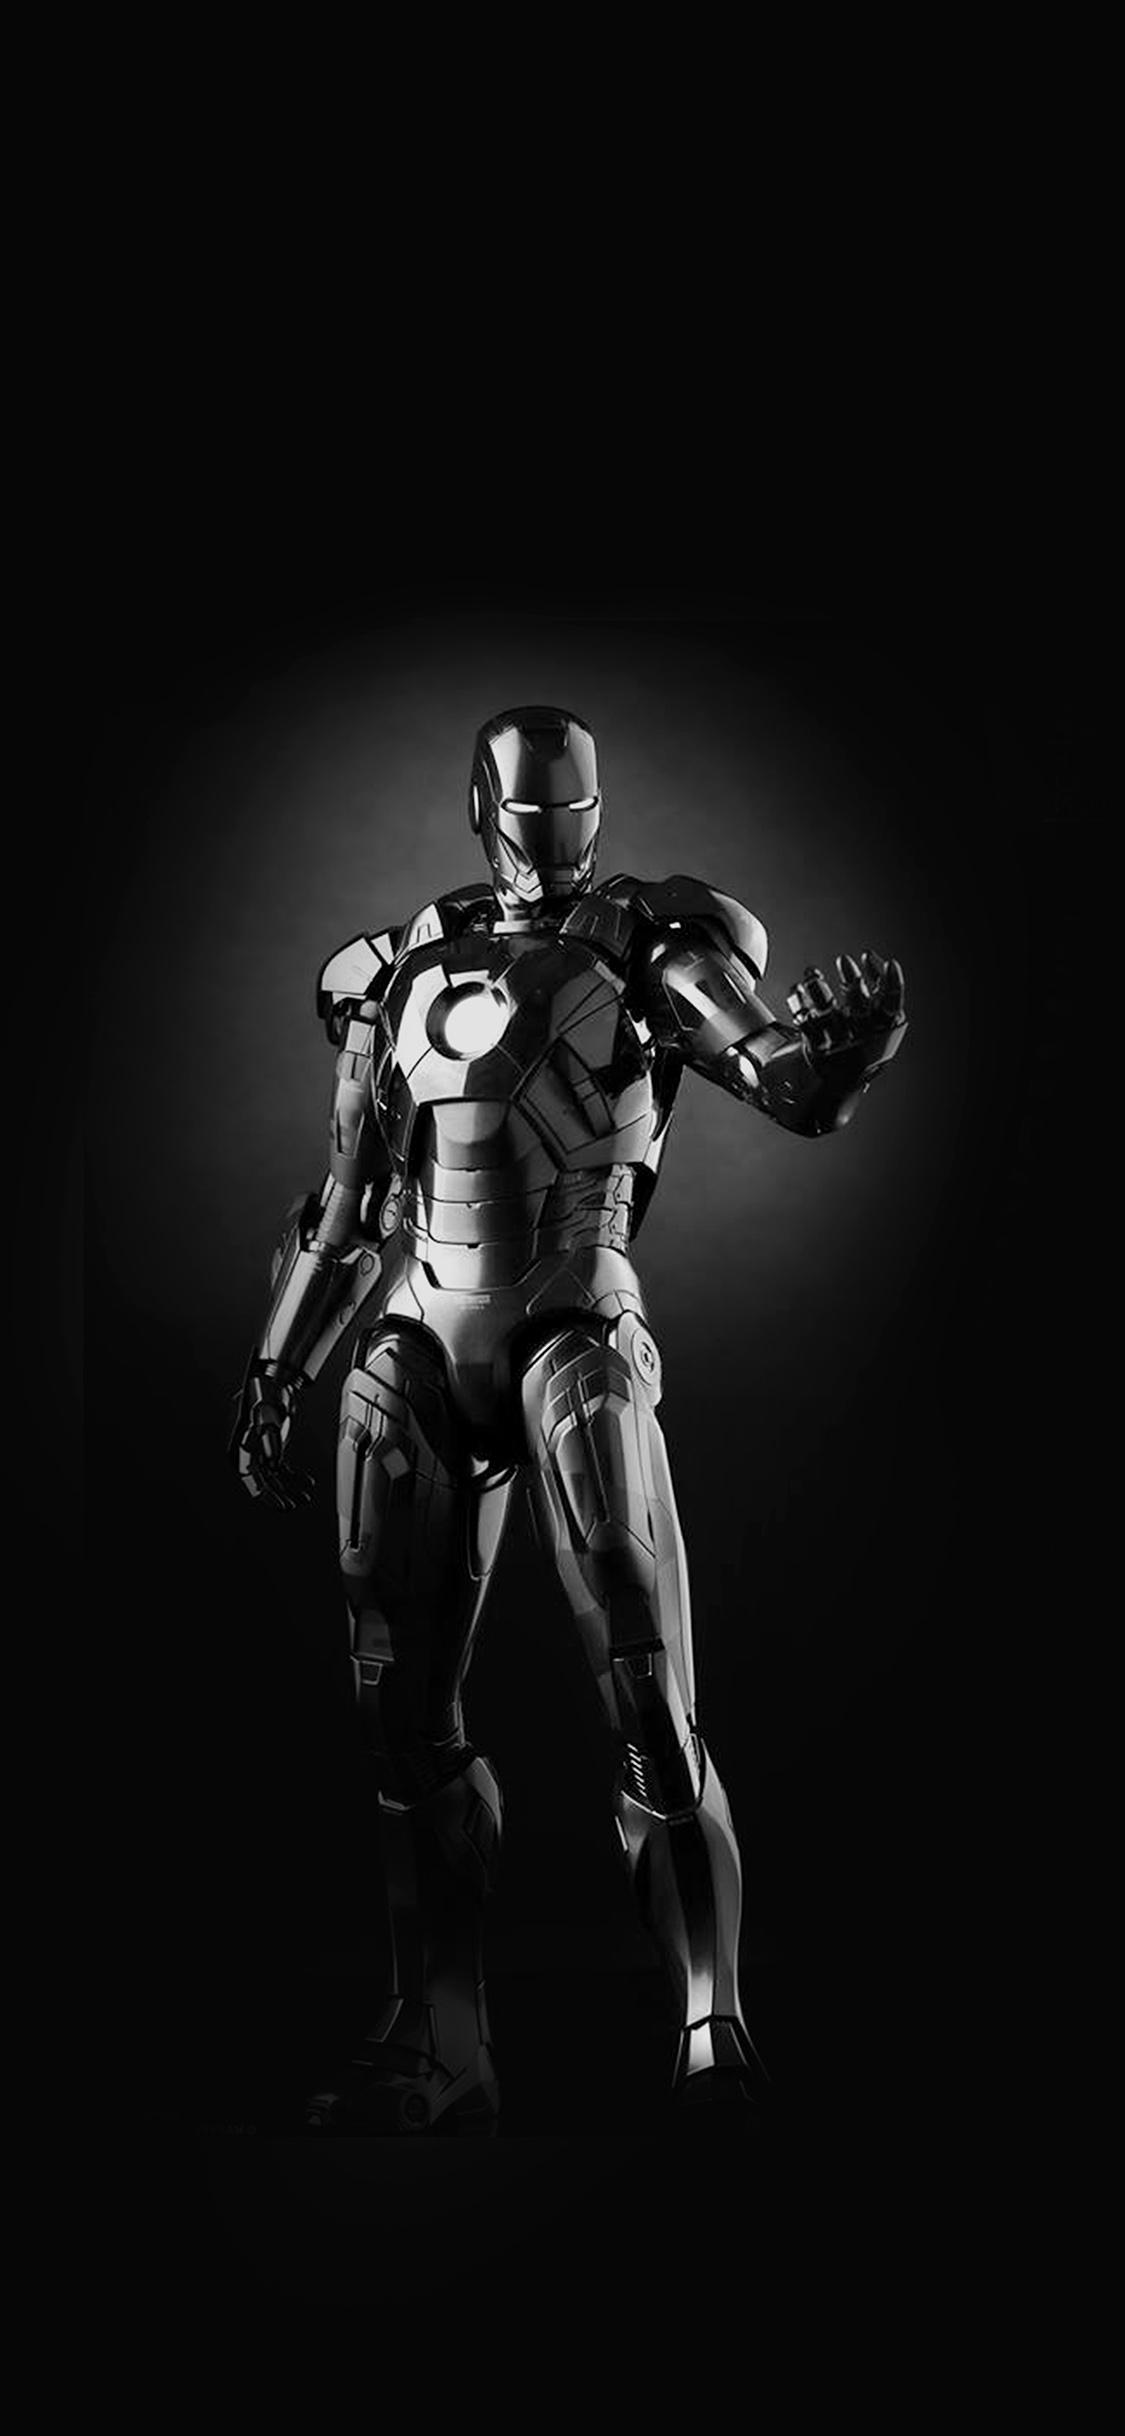 Am00 Ironman Dark Figure Hero Art Avengers Bw Wallpaper